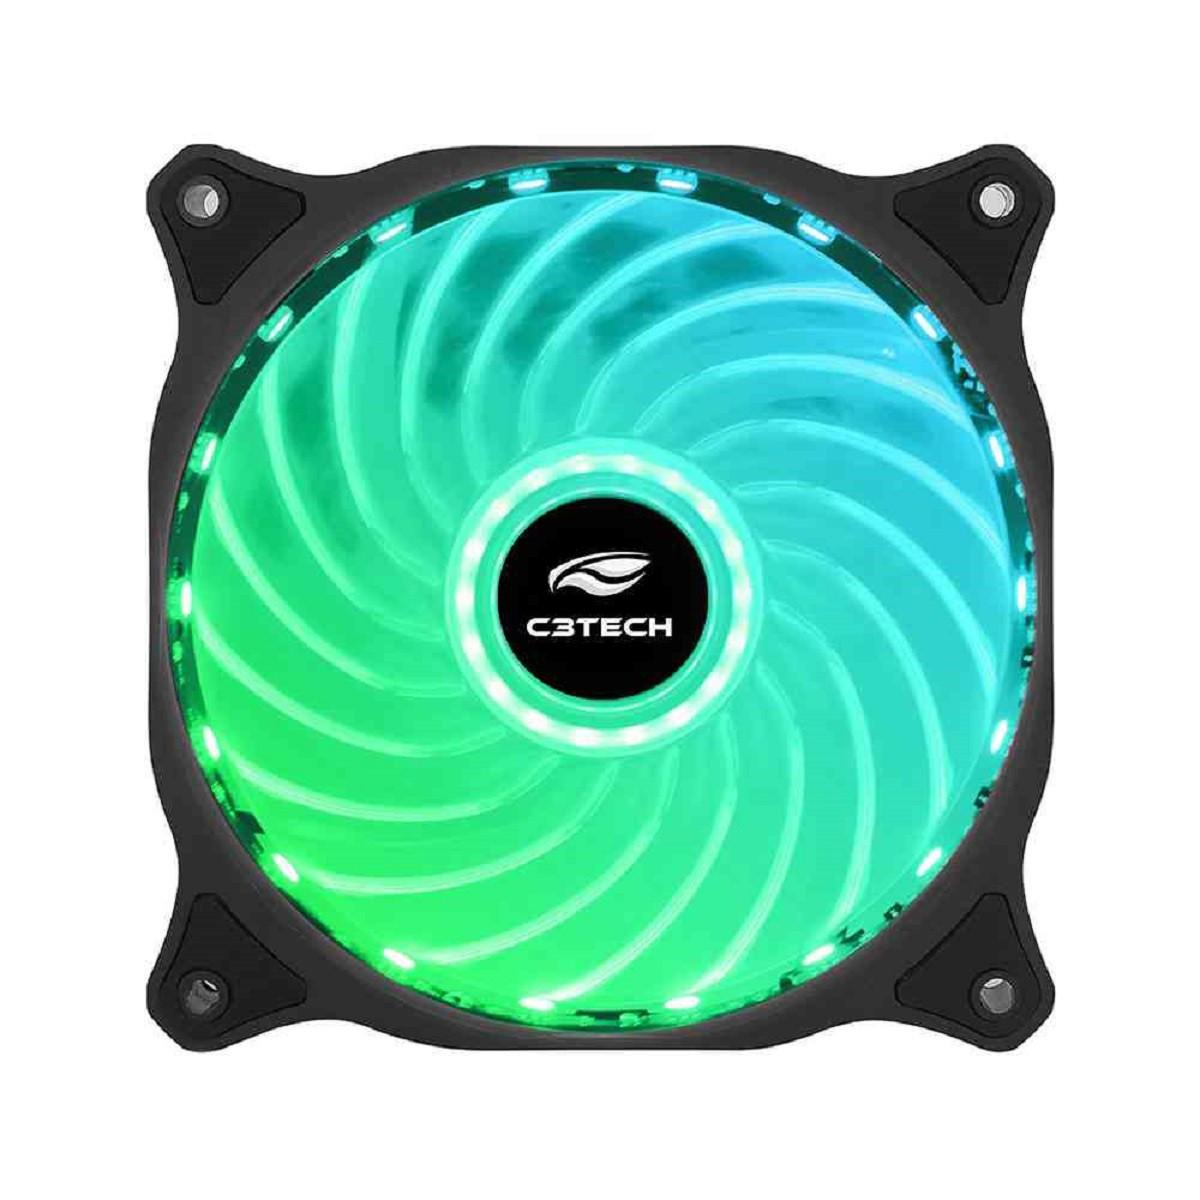 Cooler Fan 12cm RGB 18 LED Storm F9-L150RGB C3TECH